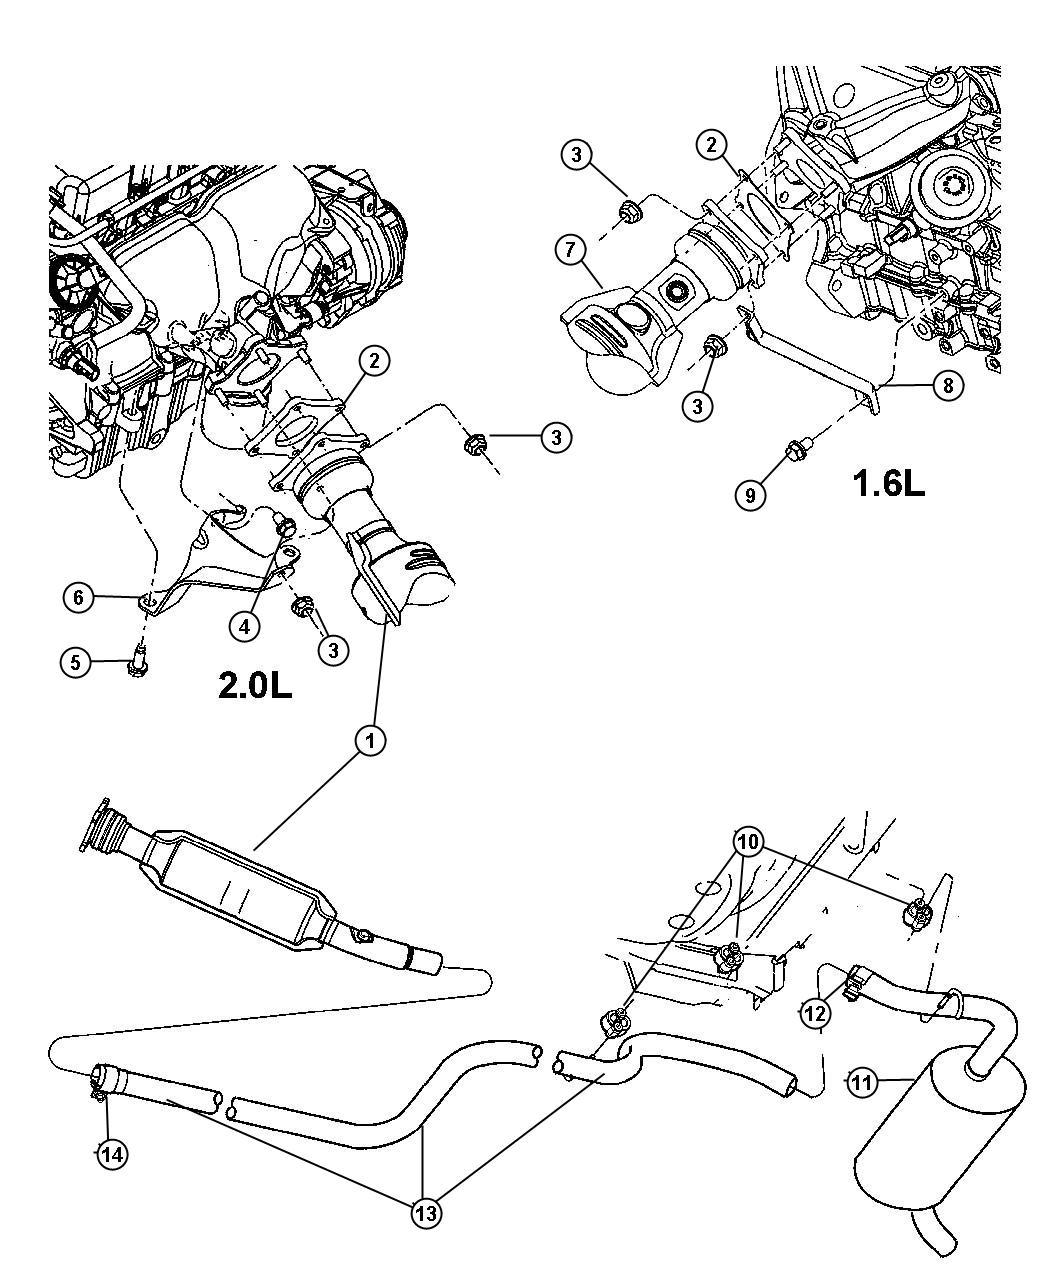 Chrysler Pt Cruiser Converter Catalytic Export Exhaust